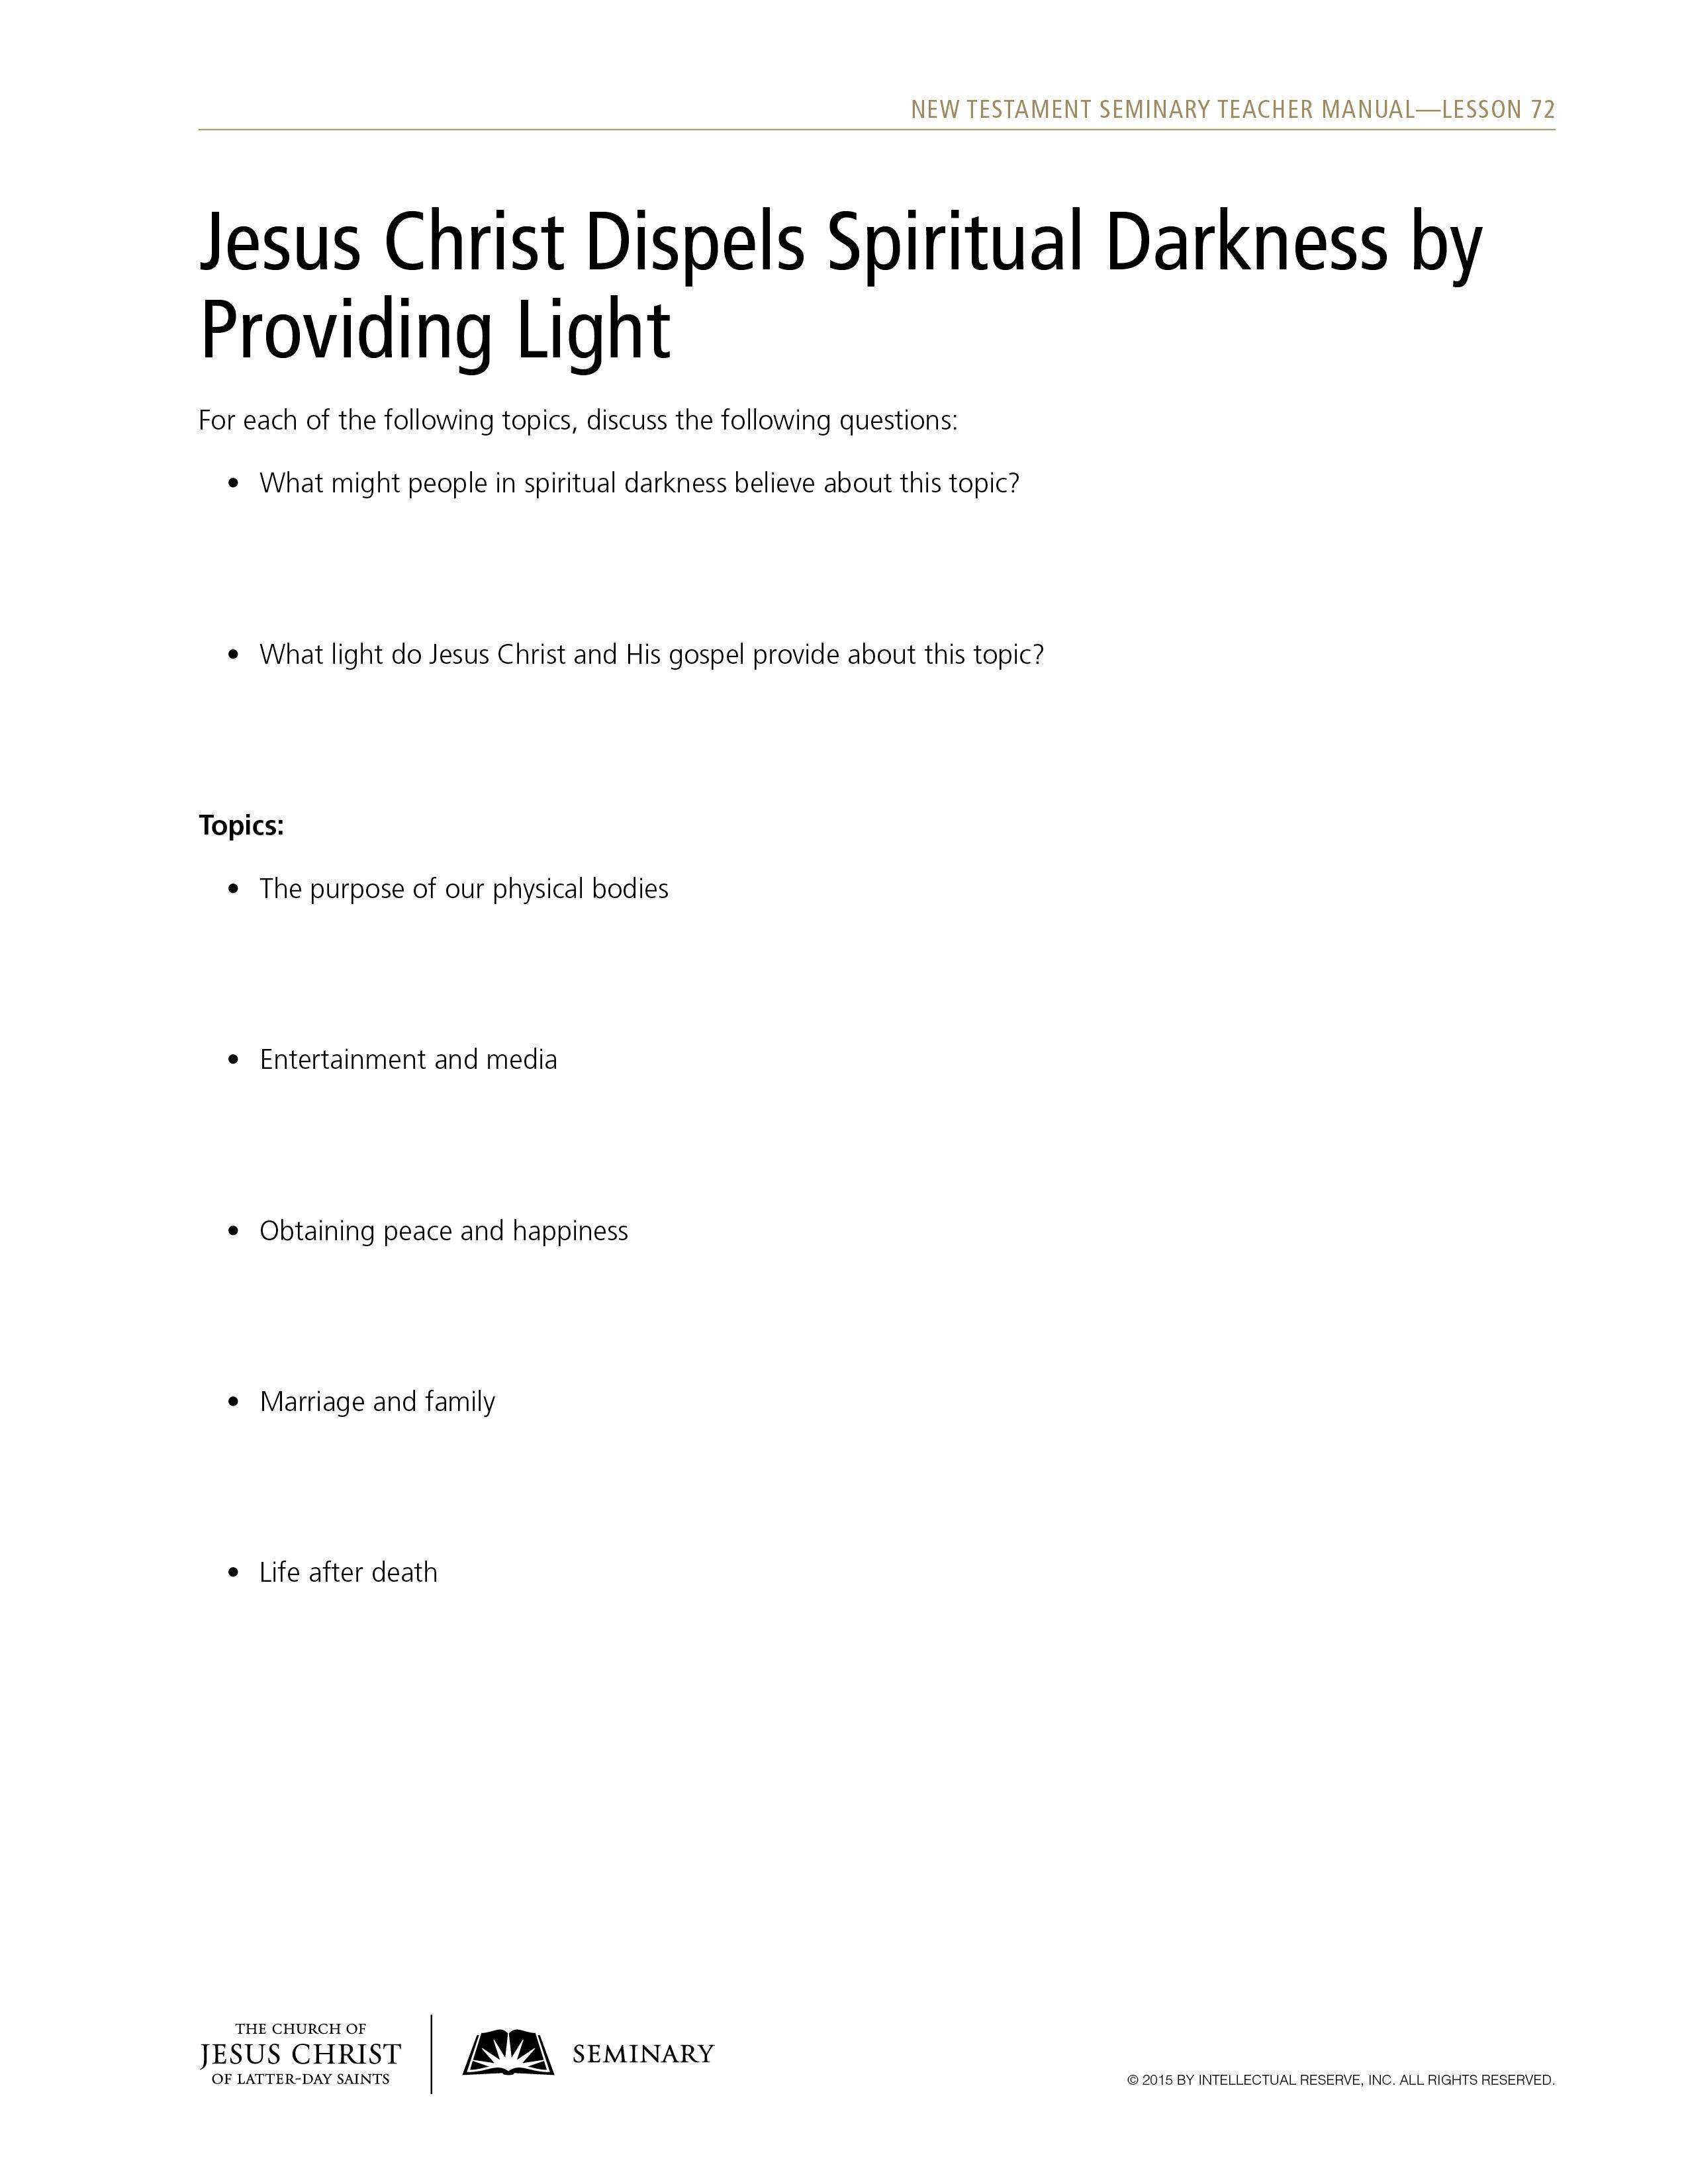 handout, Jesus Christ Dispels Spiritual Darkness